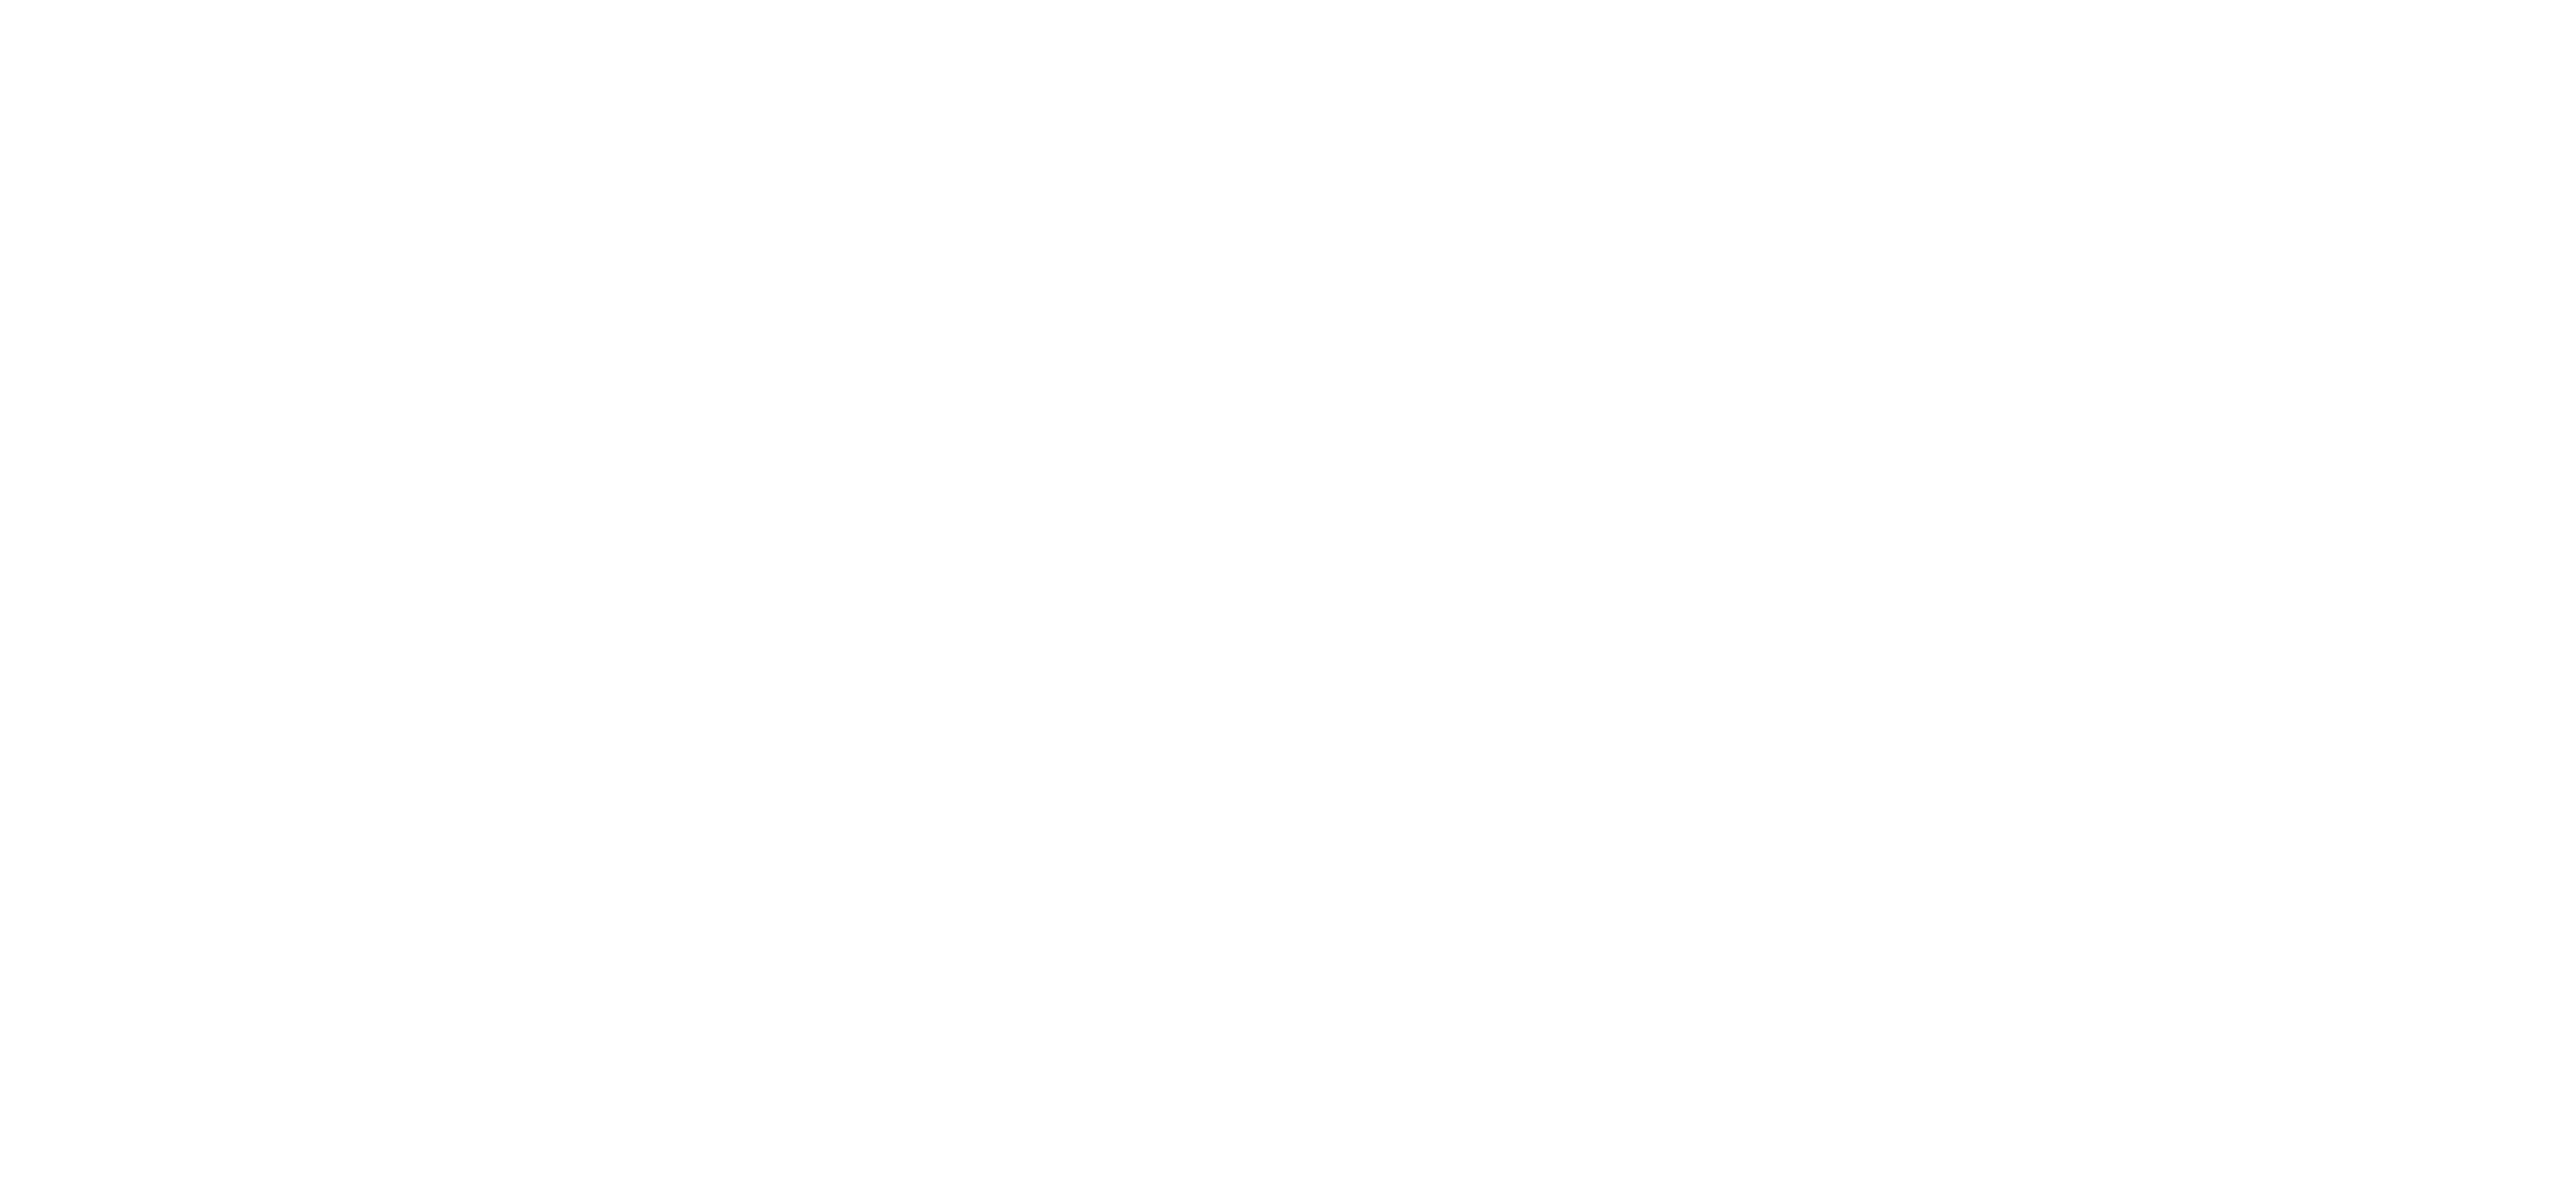 Brixton BID logo